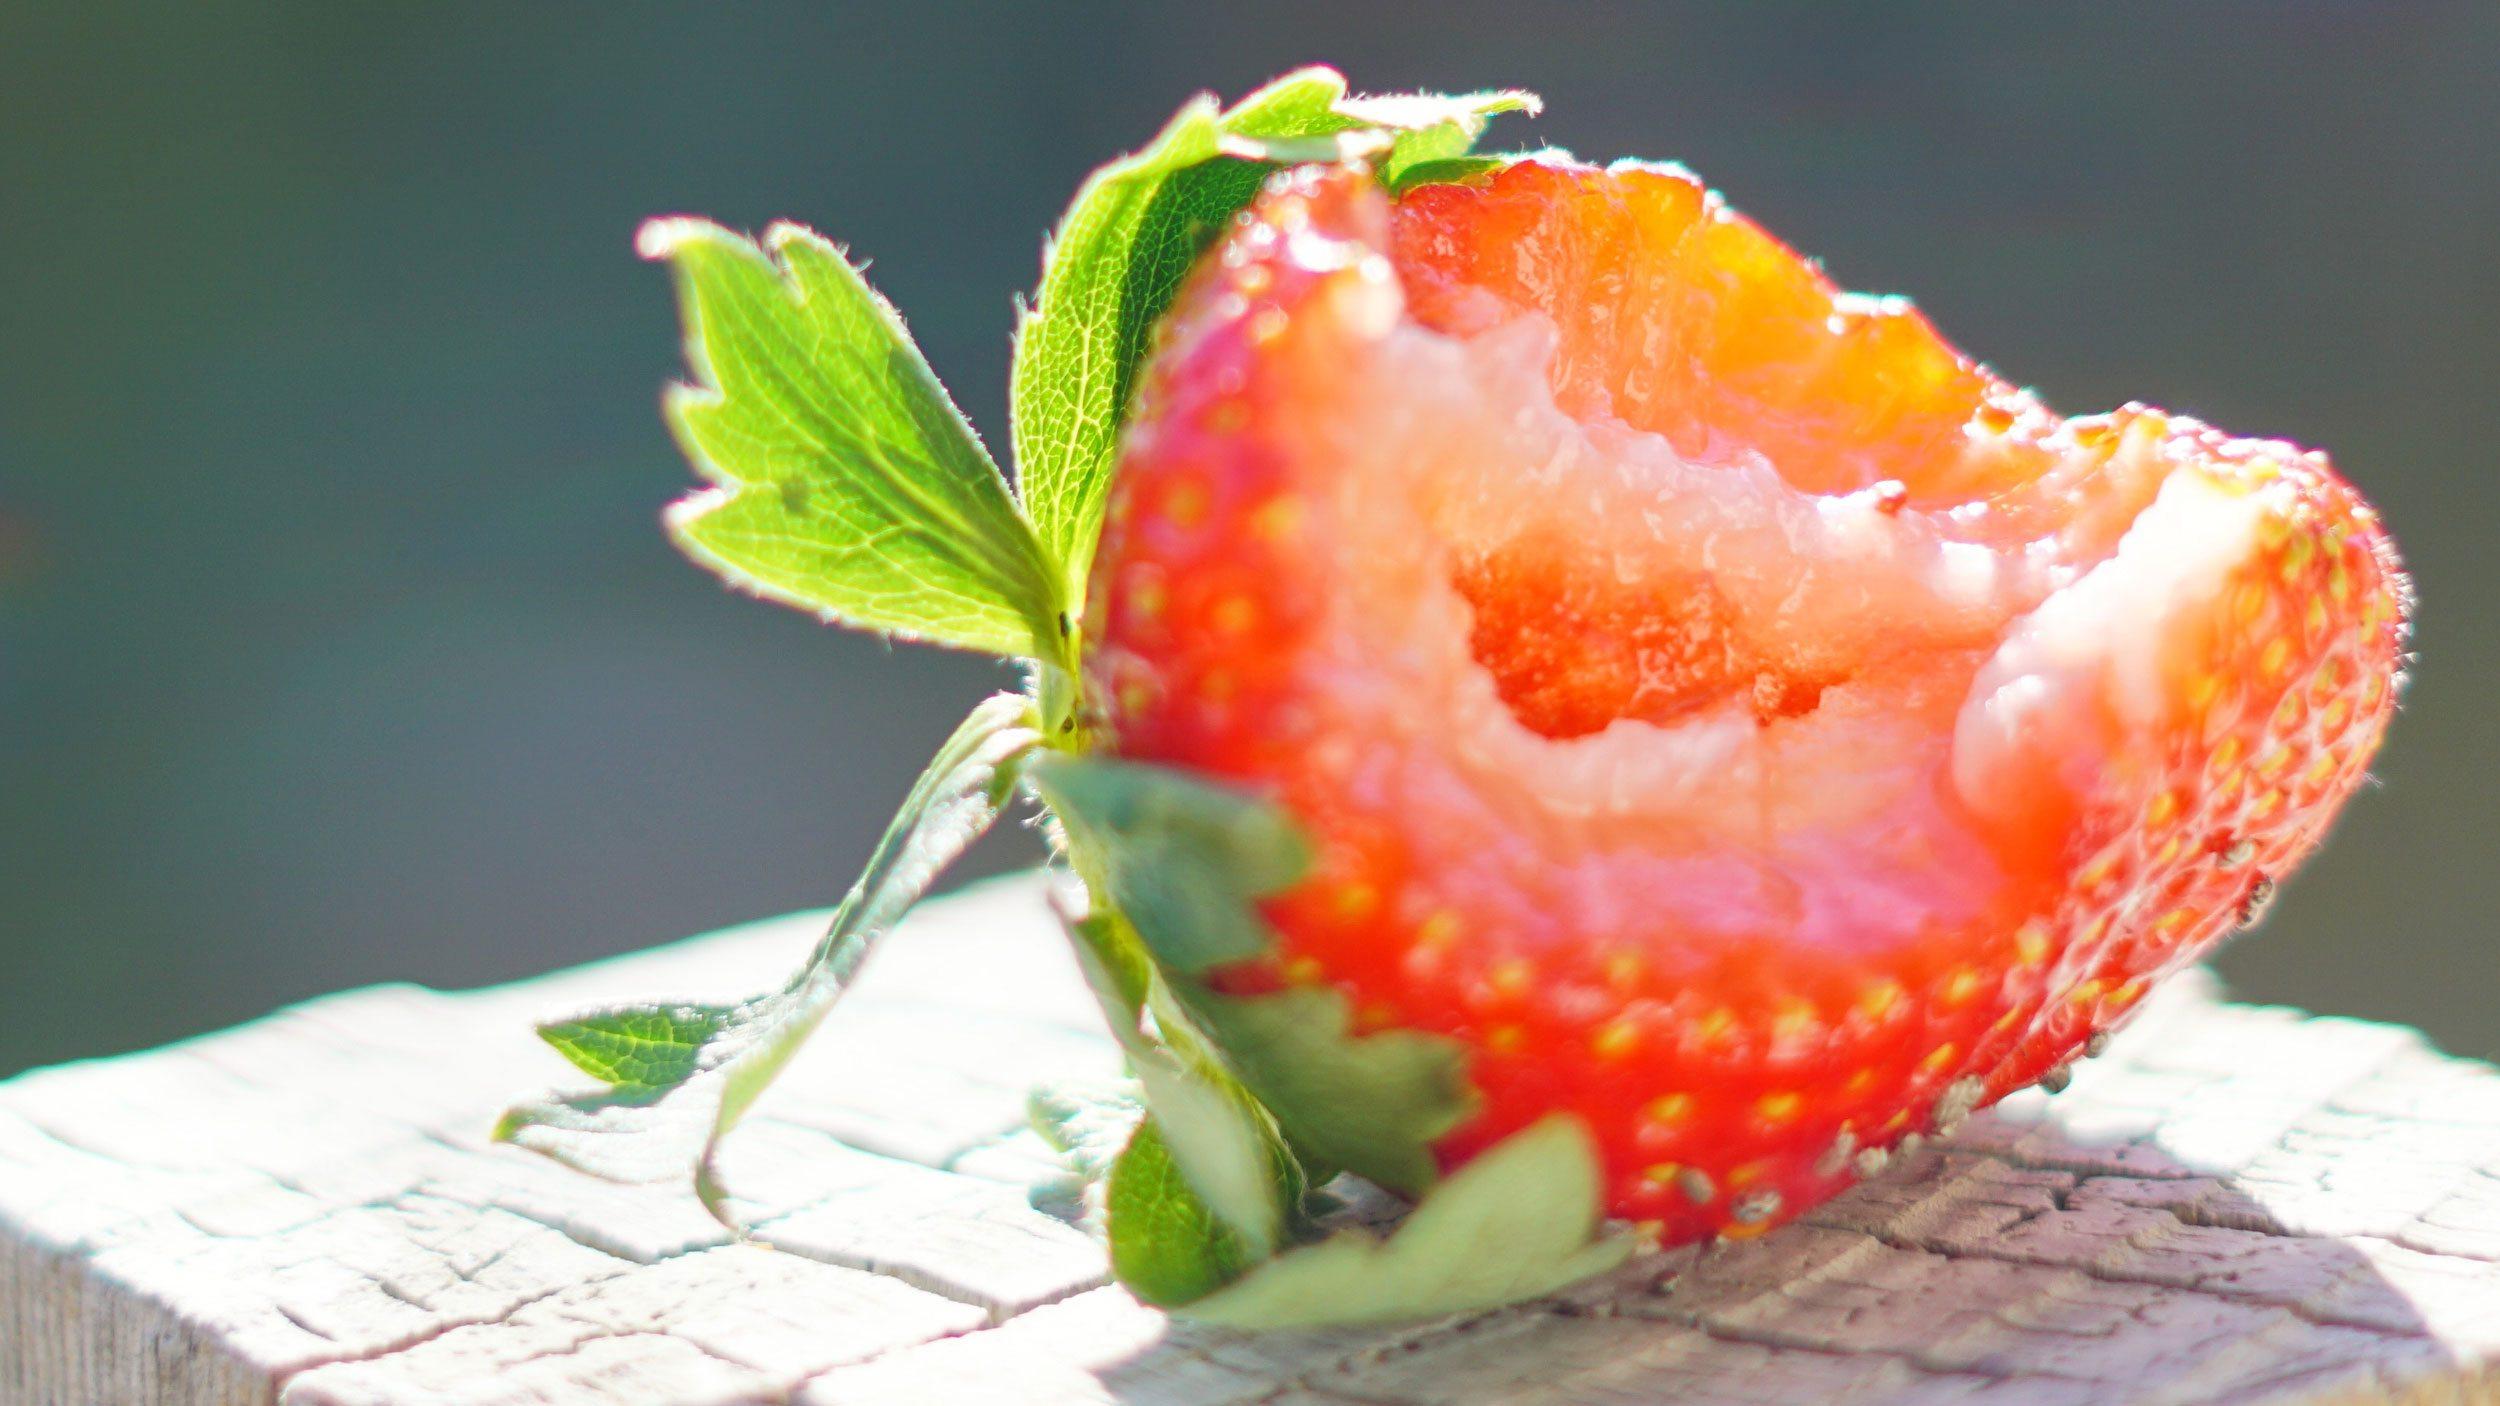 Half eaten strawberry in the sun